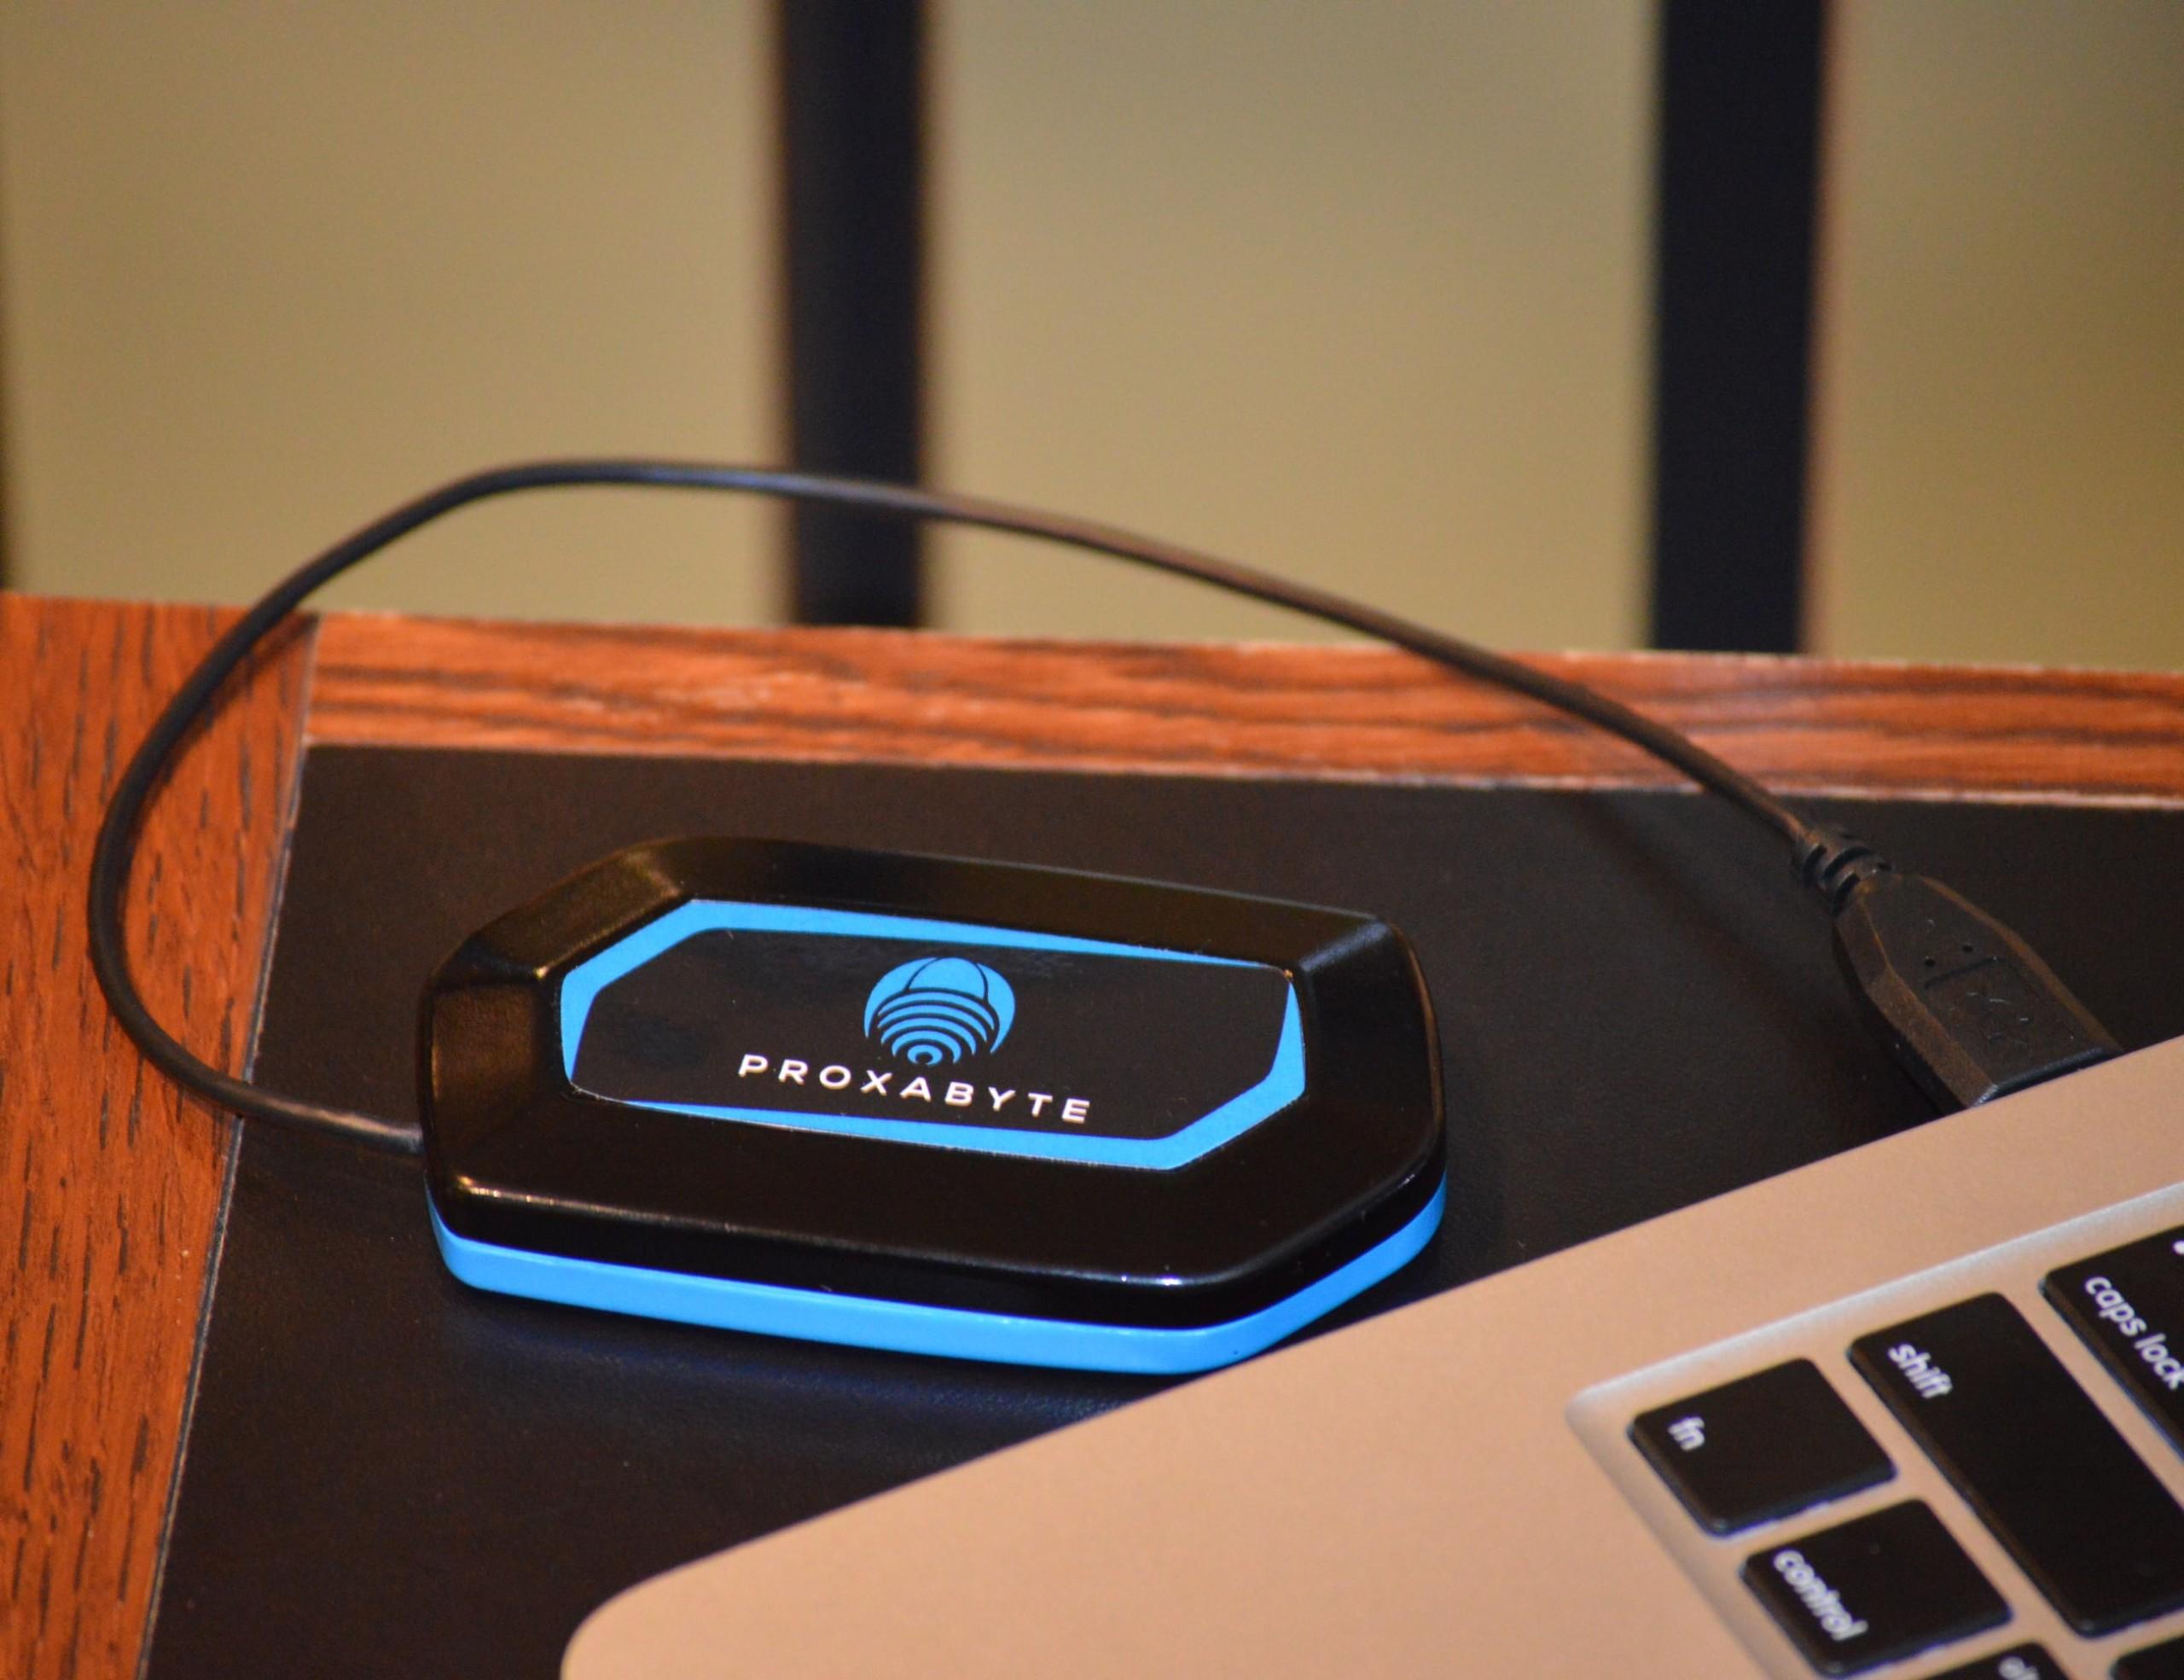 PROXABYTE Internet and VPN Accelerator